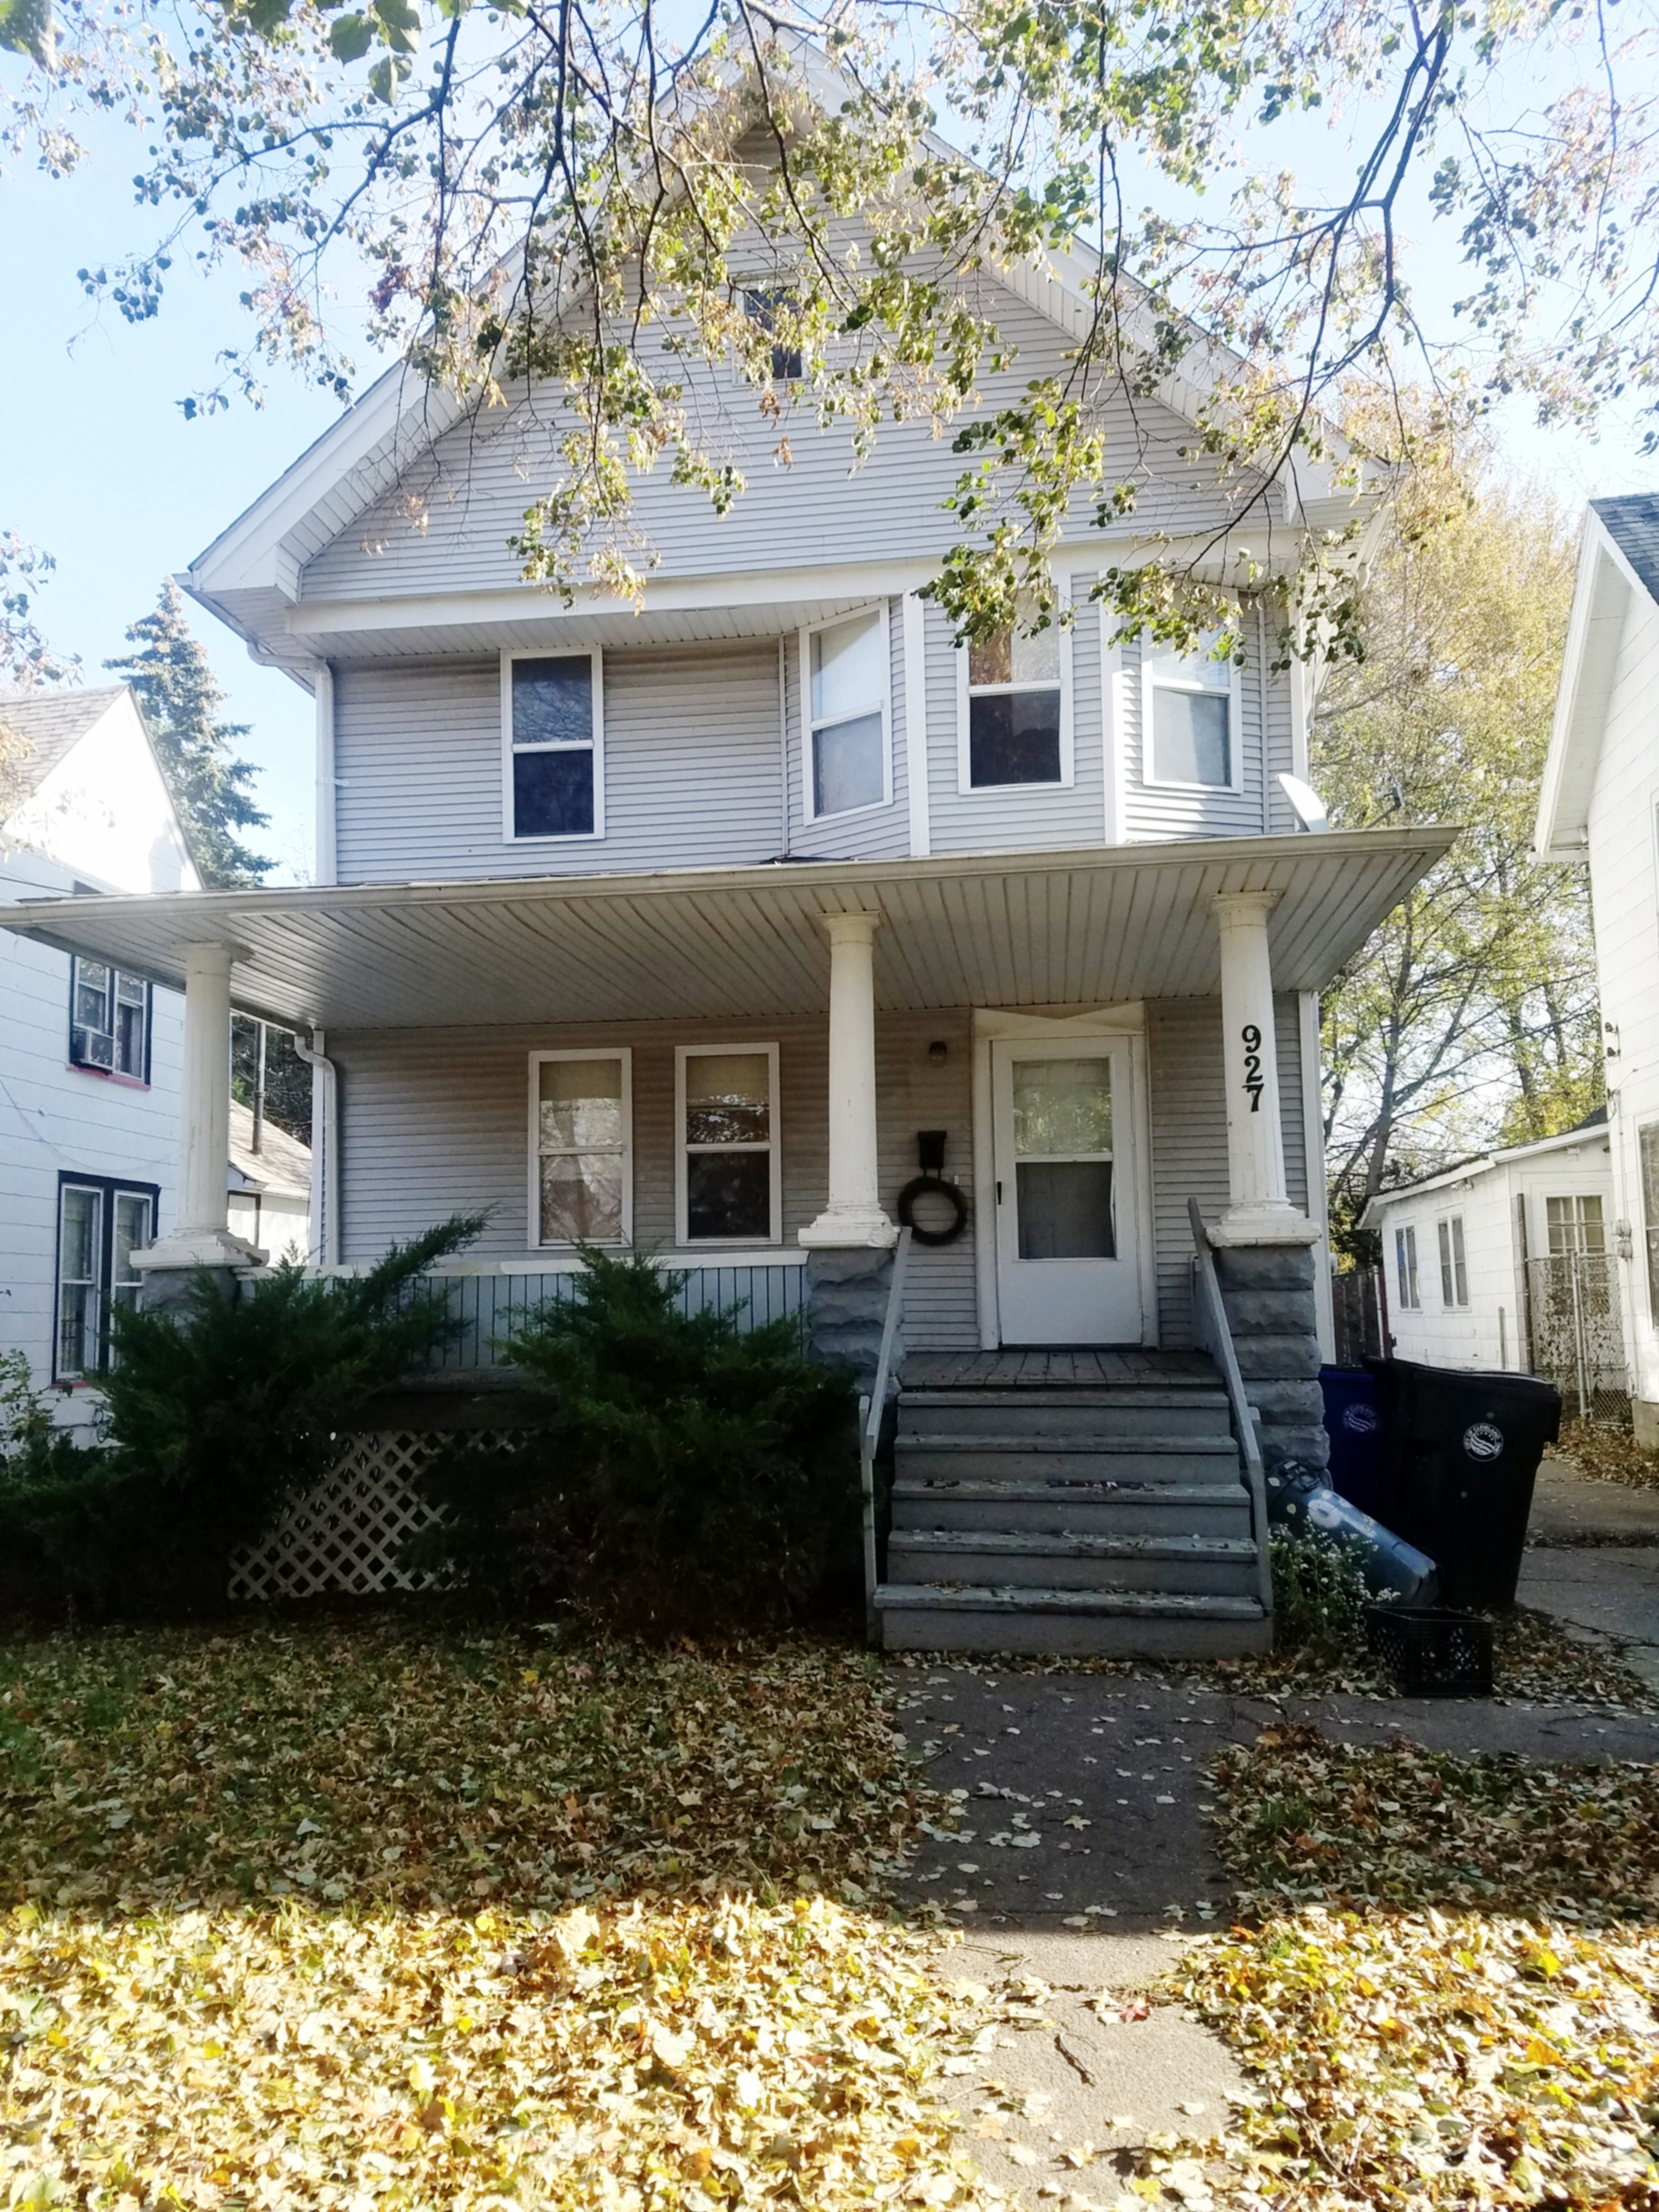 927 E 149 St., Cleveland | 3 bed 1 bath | 1,316 Sq. Ft. | $23,275